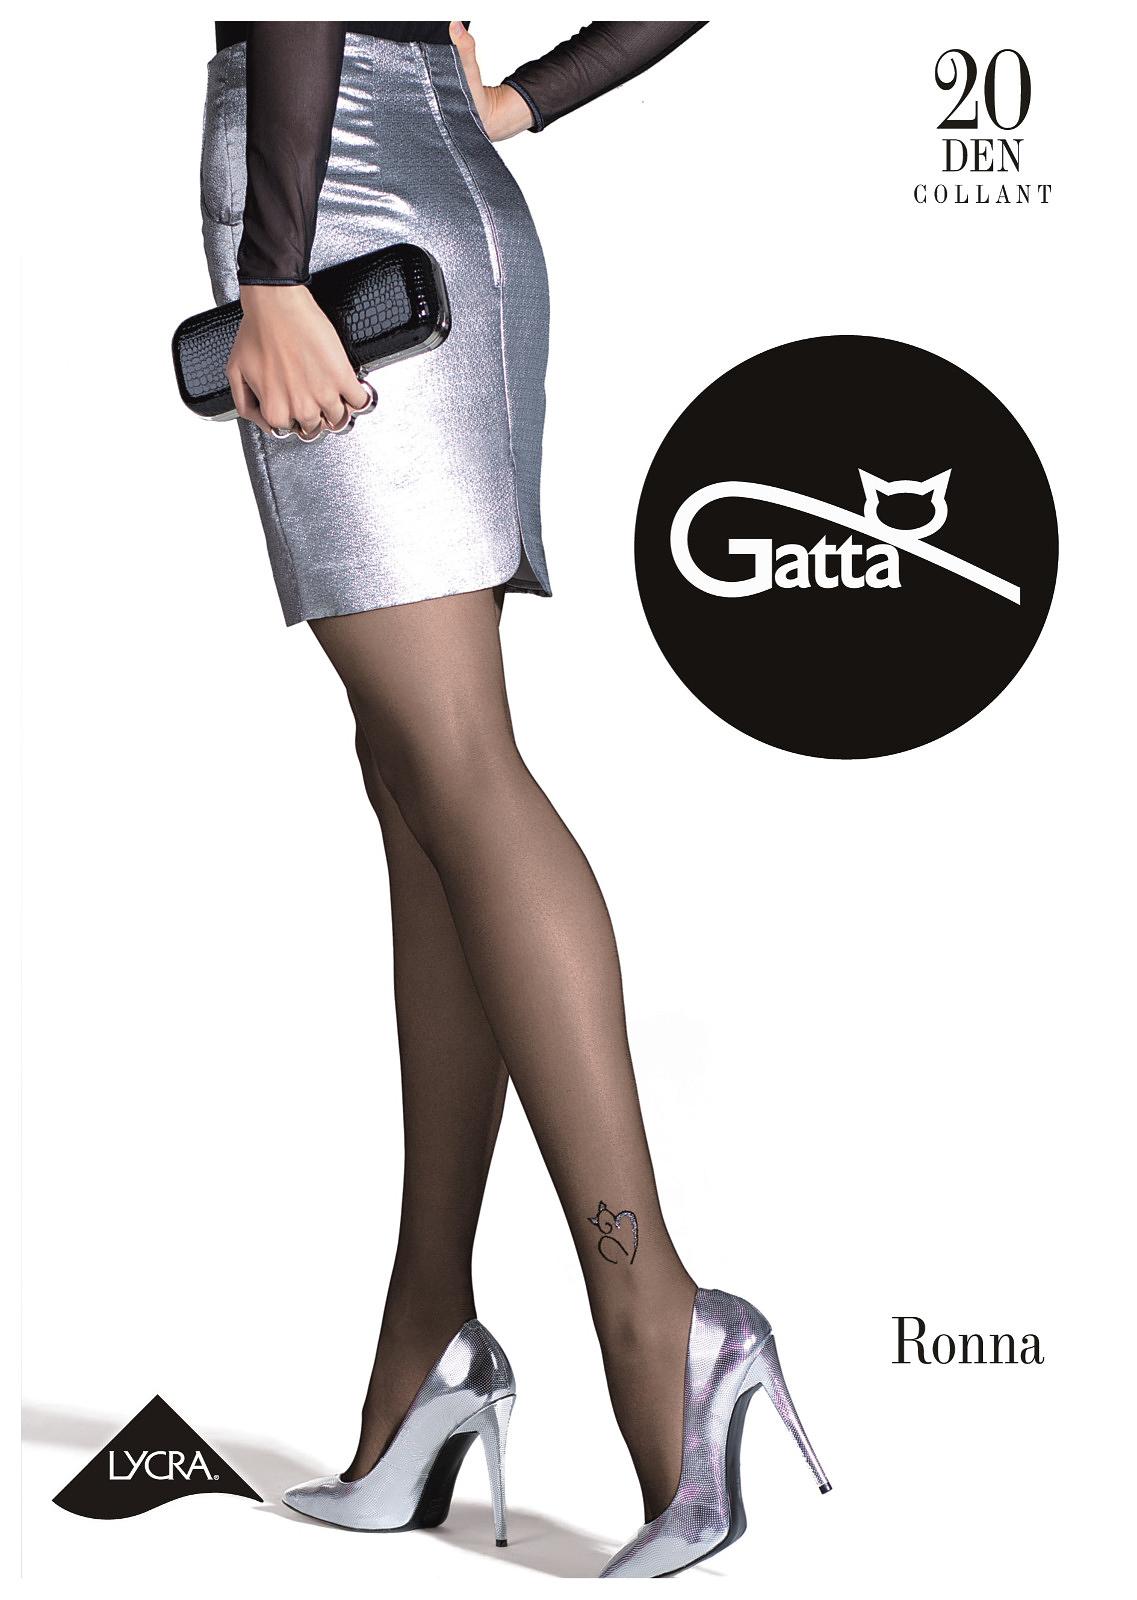 Punčochové kalhoty Gatta Ronna nr 30 20 den - Černá 2-S empty 493d0ebfa0